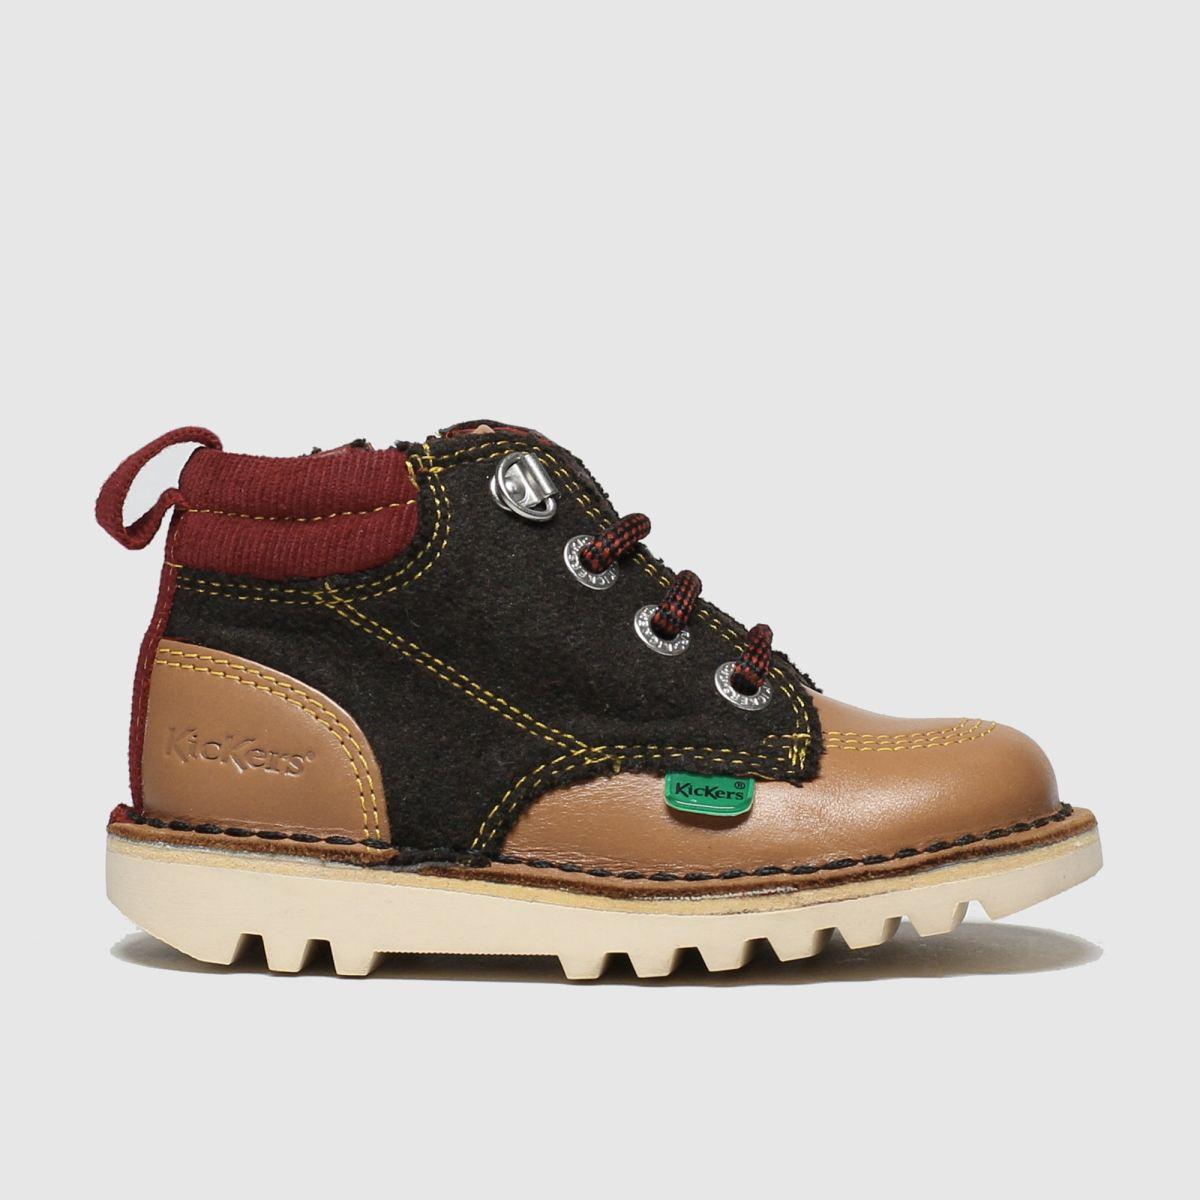 Kickers Brown & Red Kick Hi Winterised Boots Toddler